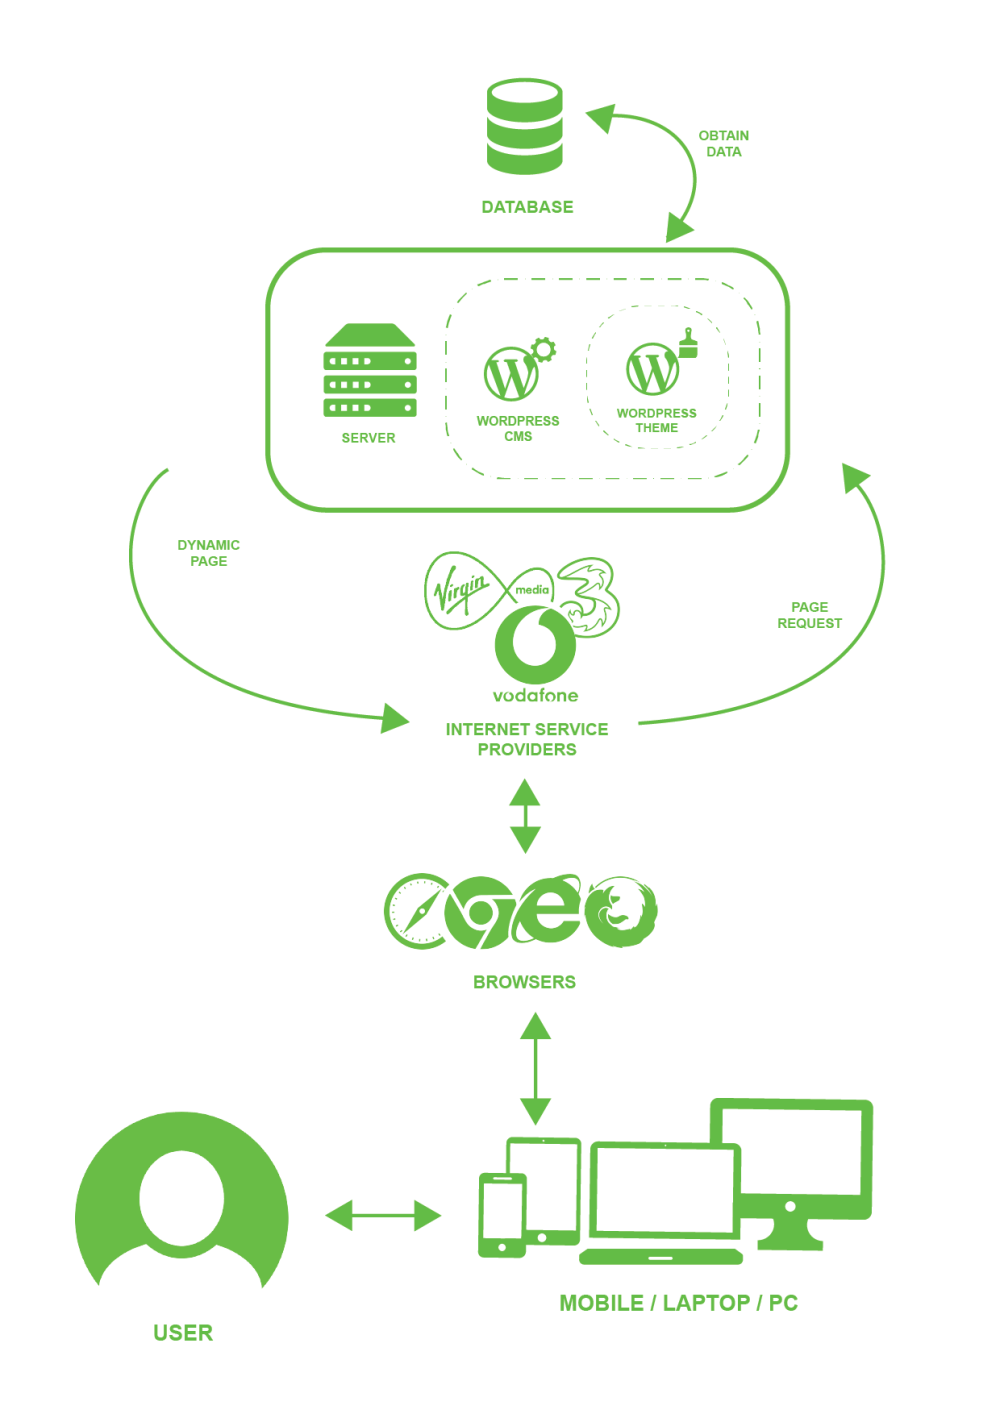 medium resolution of system overview diagram for wordpress website